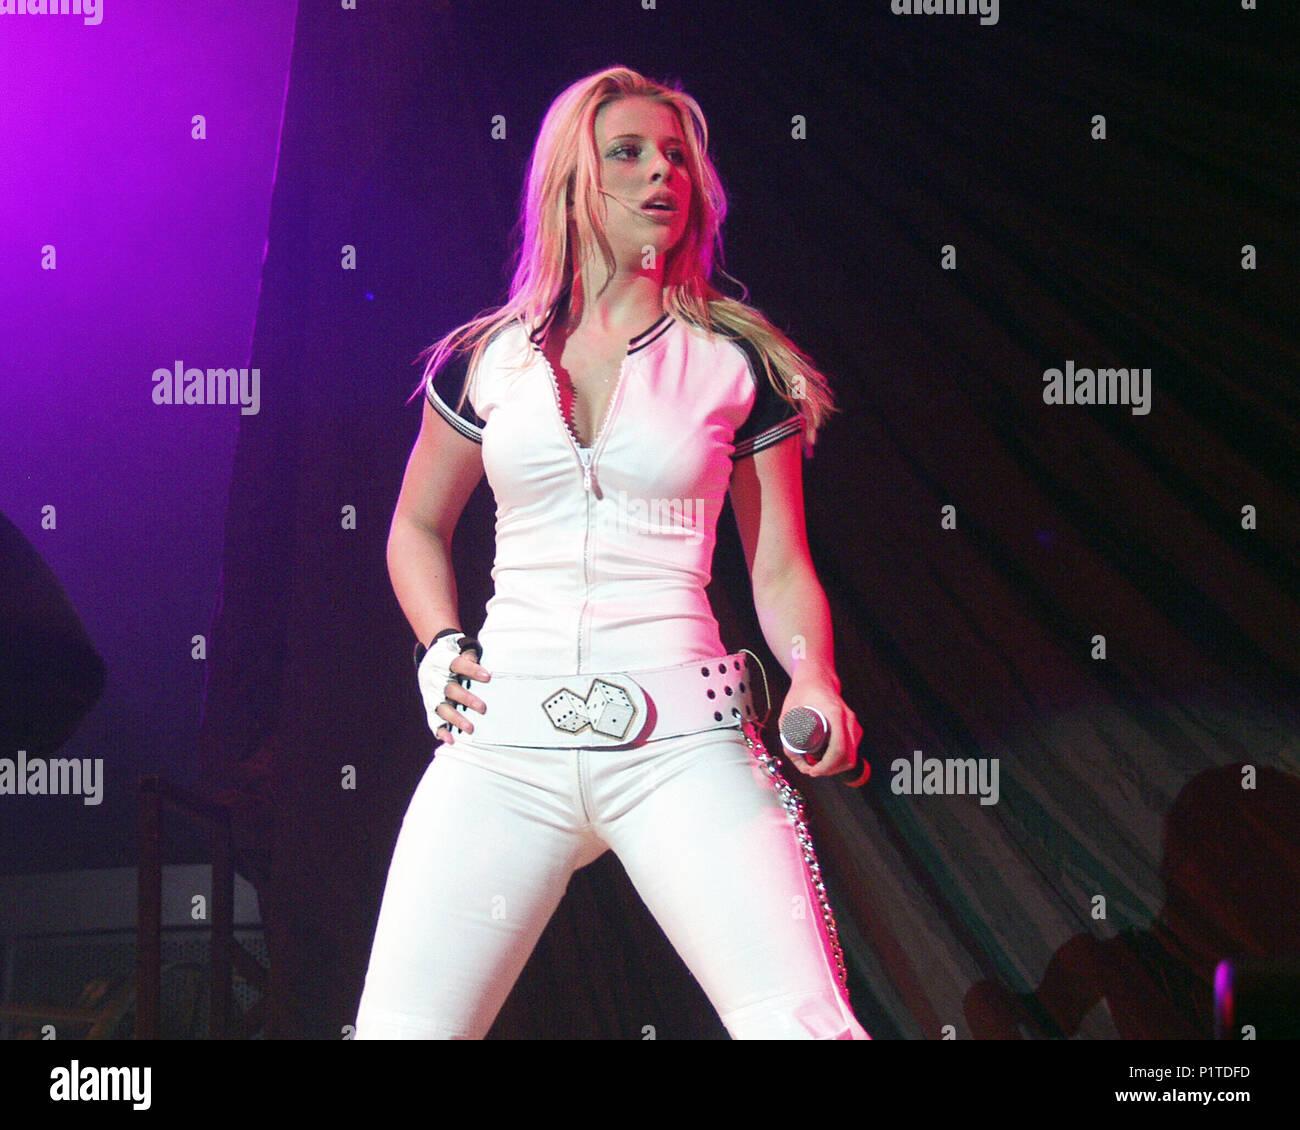 Heather Angel (actress) Adult videos Husna,Sriti Jha 2006